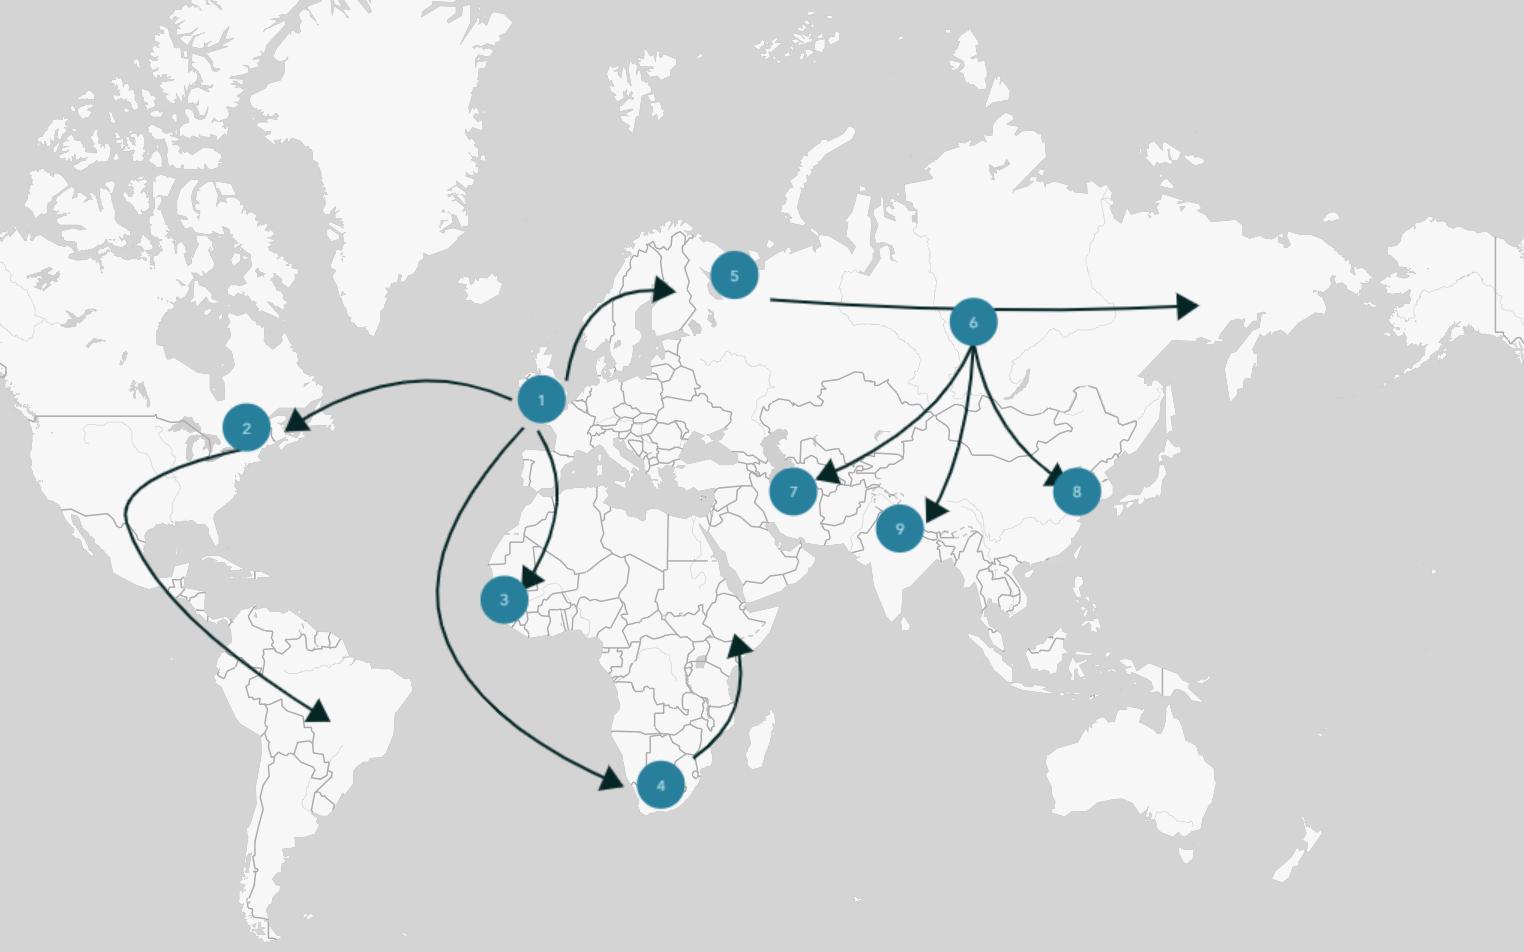 Spanish Flu Spread Map